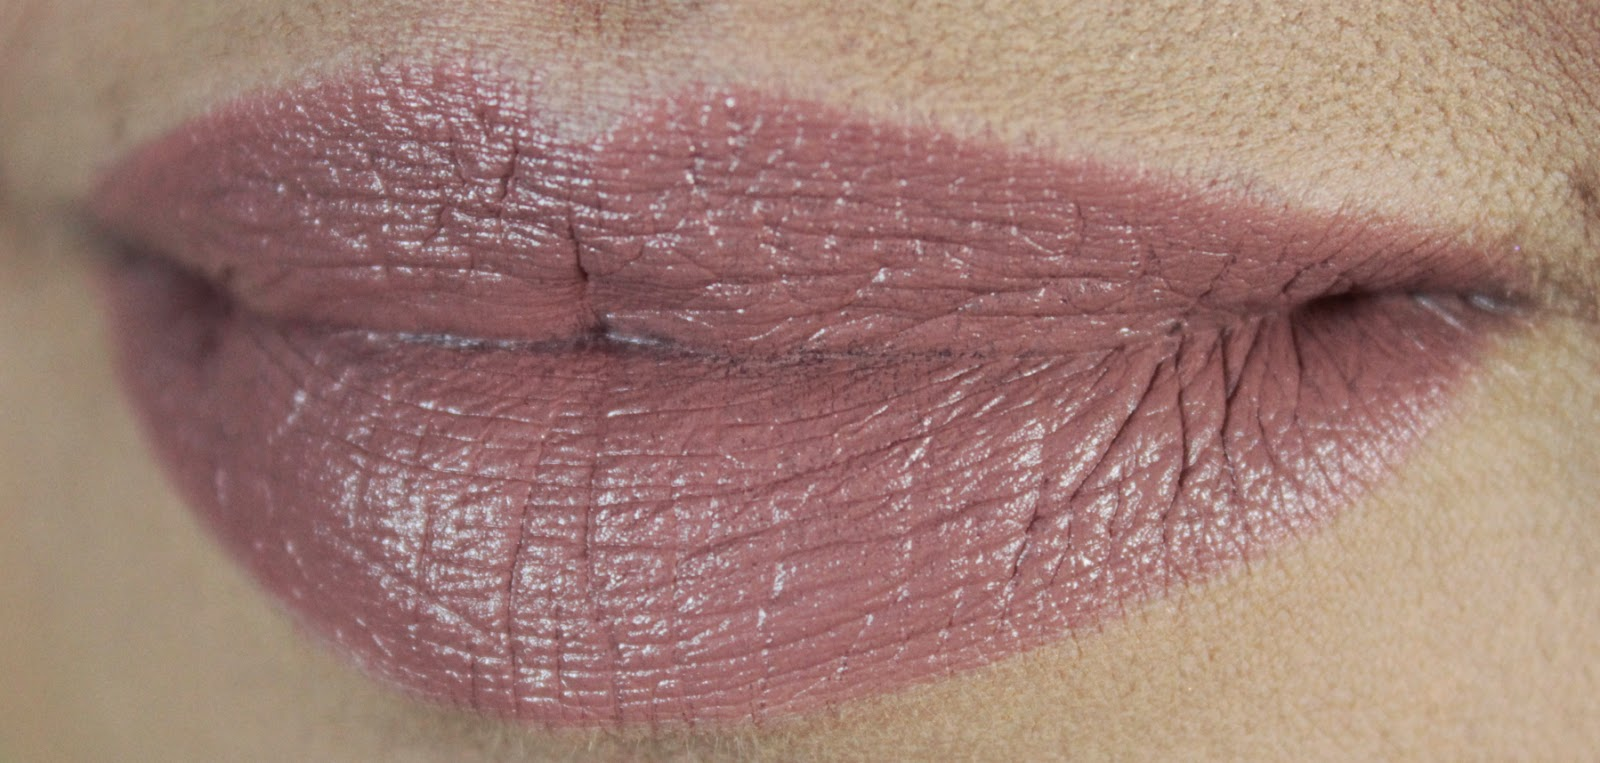 mac, batom, viva glam, aids, viva glam 2, lipstick, nude, hiv, maquiagem, fashion mimi, makeup